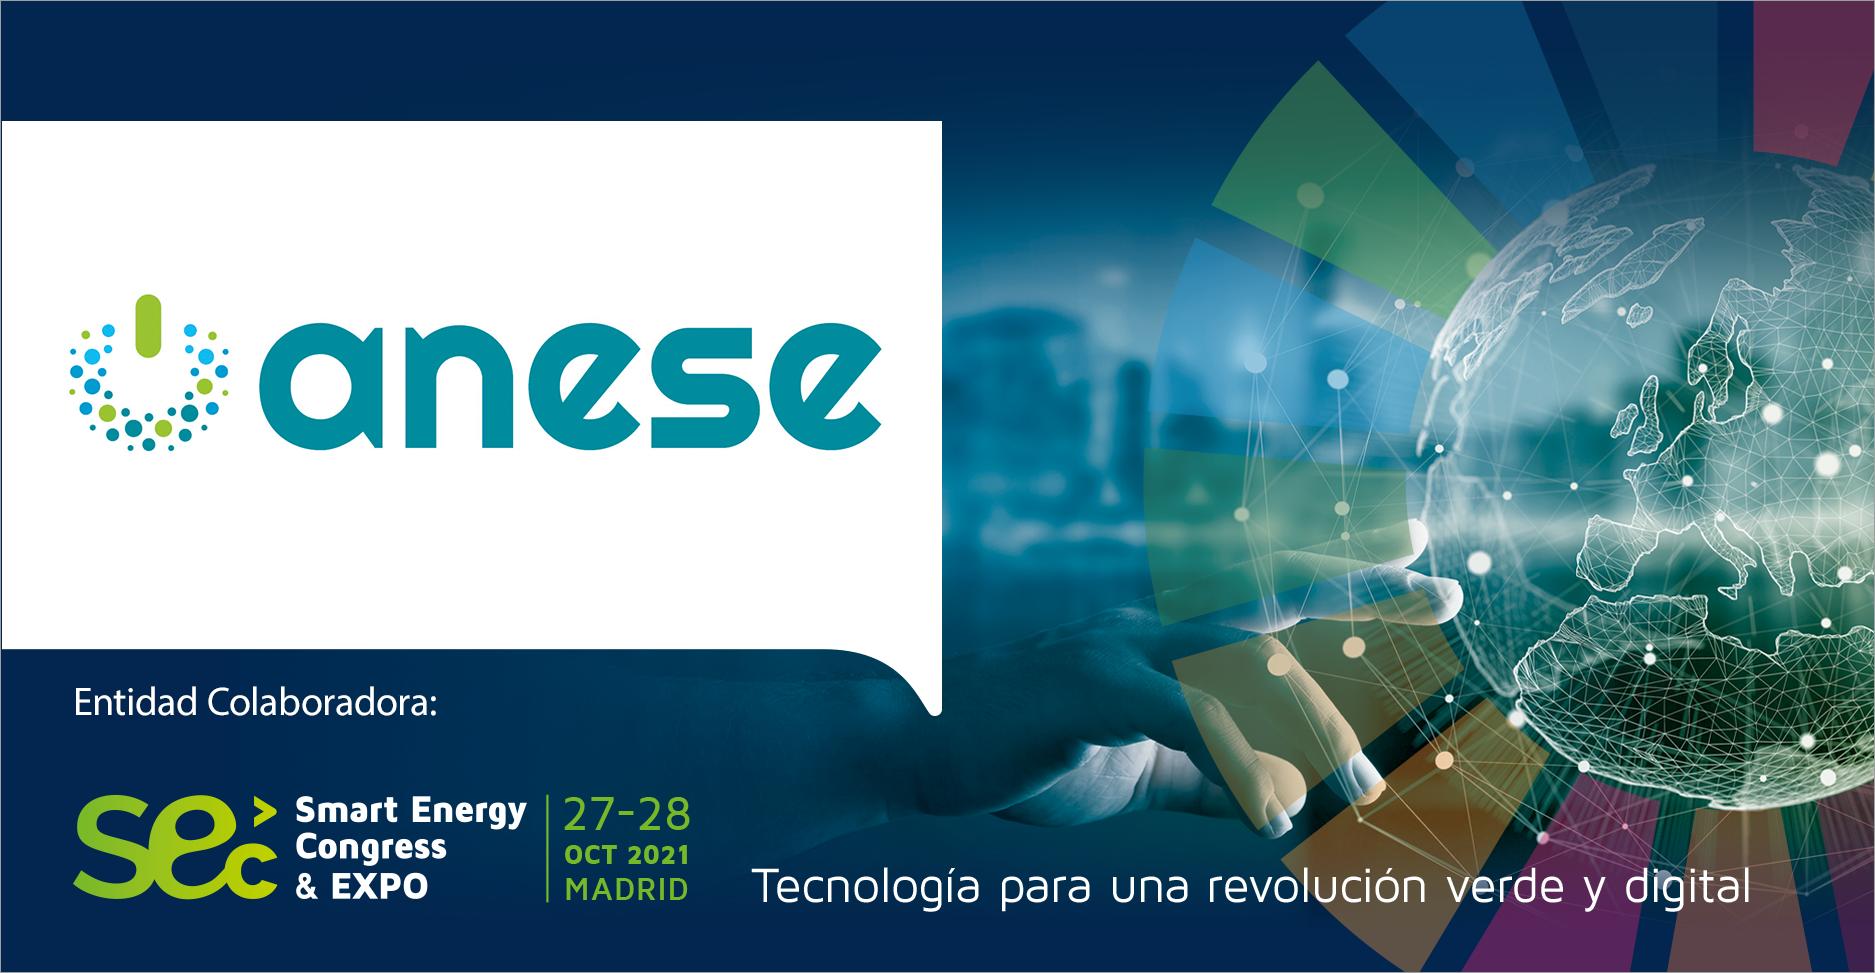 ANESE participa como entidad colaboradora en la IX Smart Energy Congress & EXPO 2021